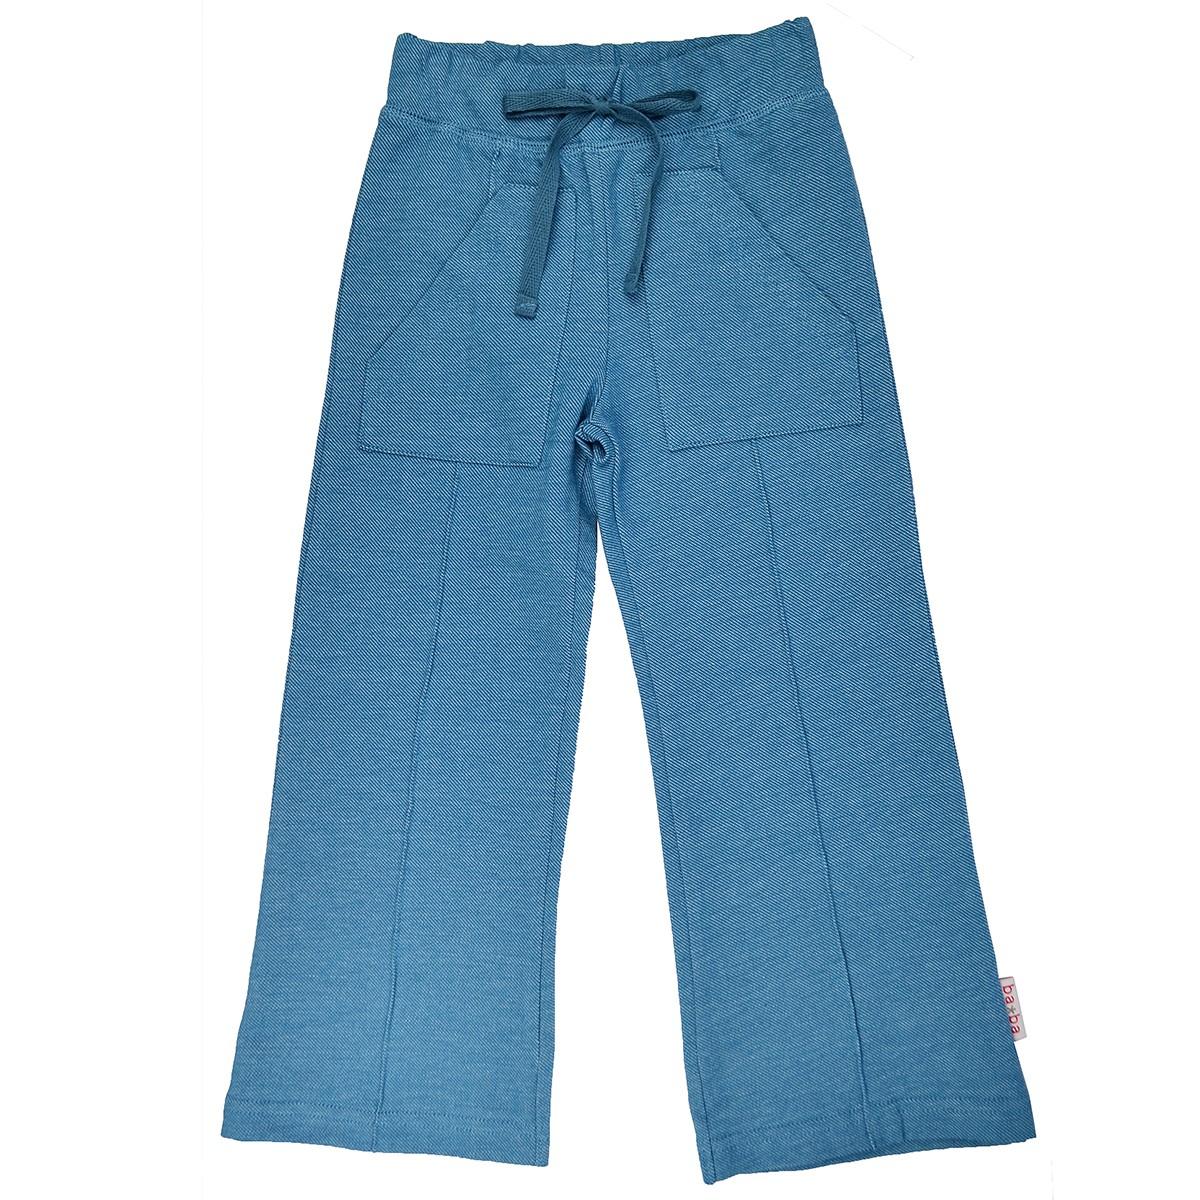 Pocket pants tapestry